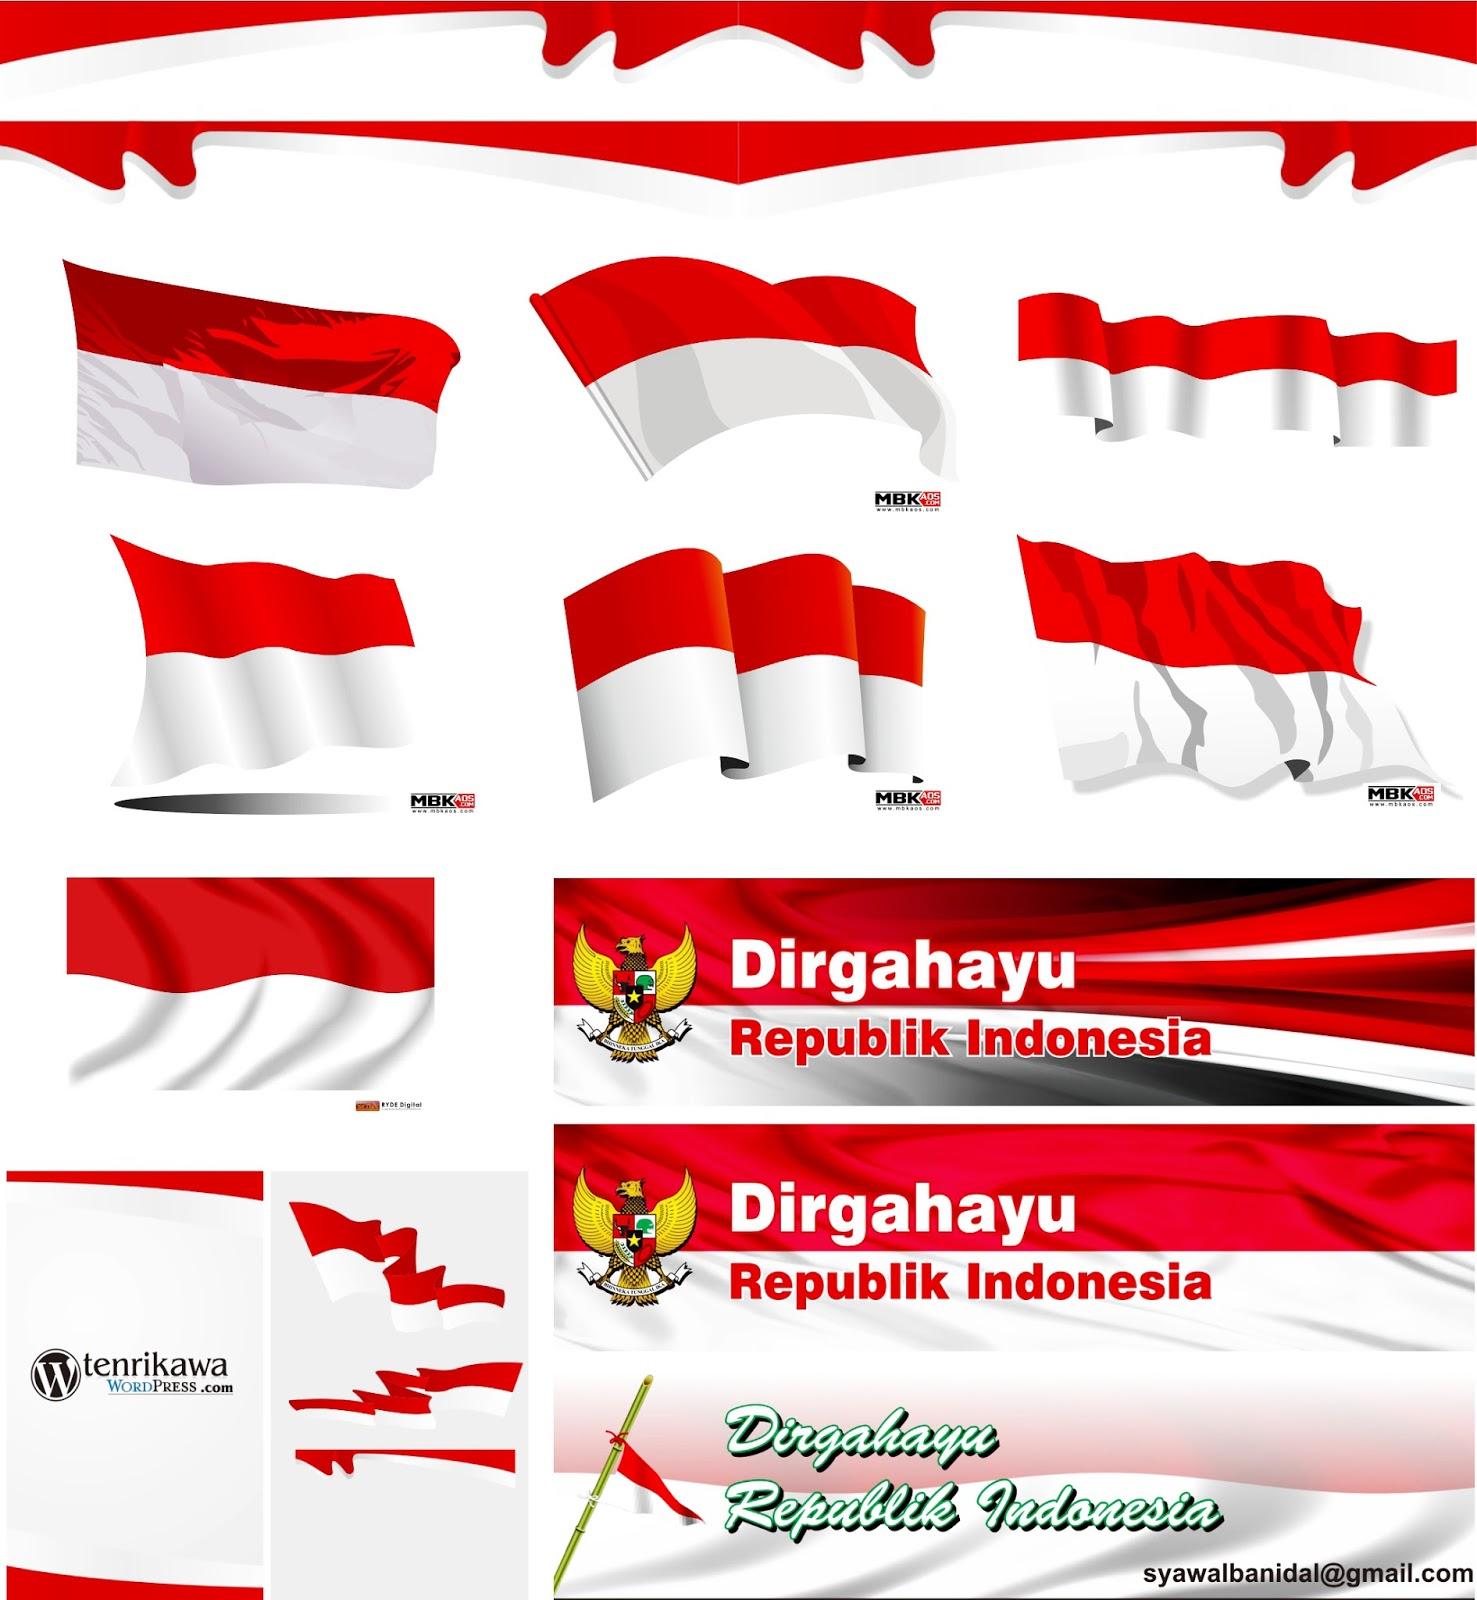 unduh 440 background banner merah putih cdr terbaik download background unduh 440 background banner merah putih